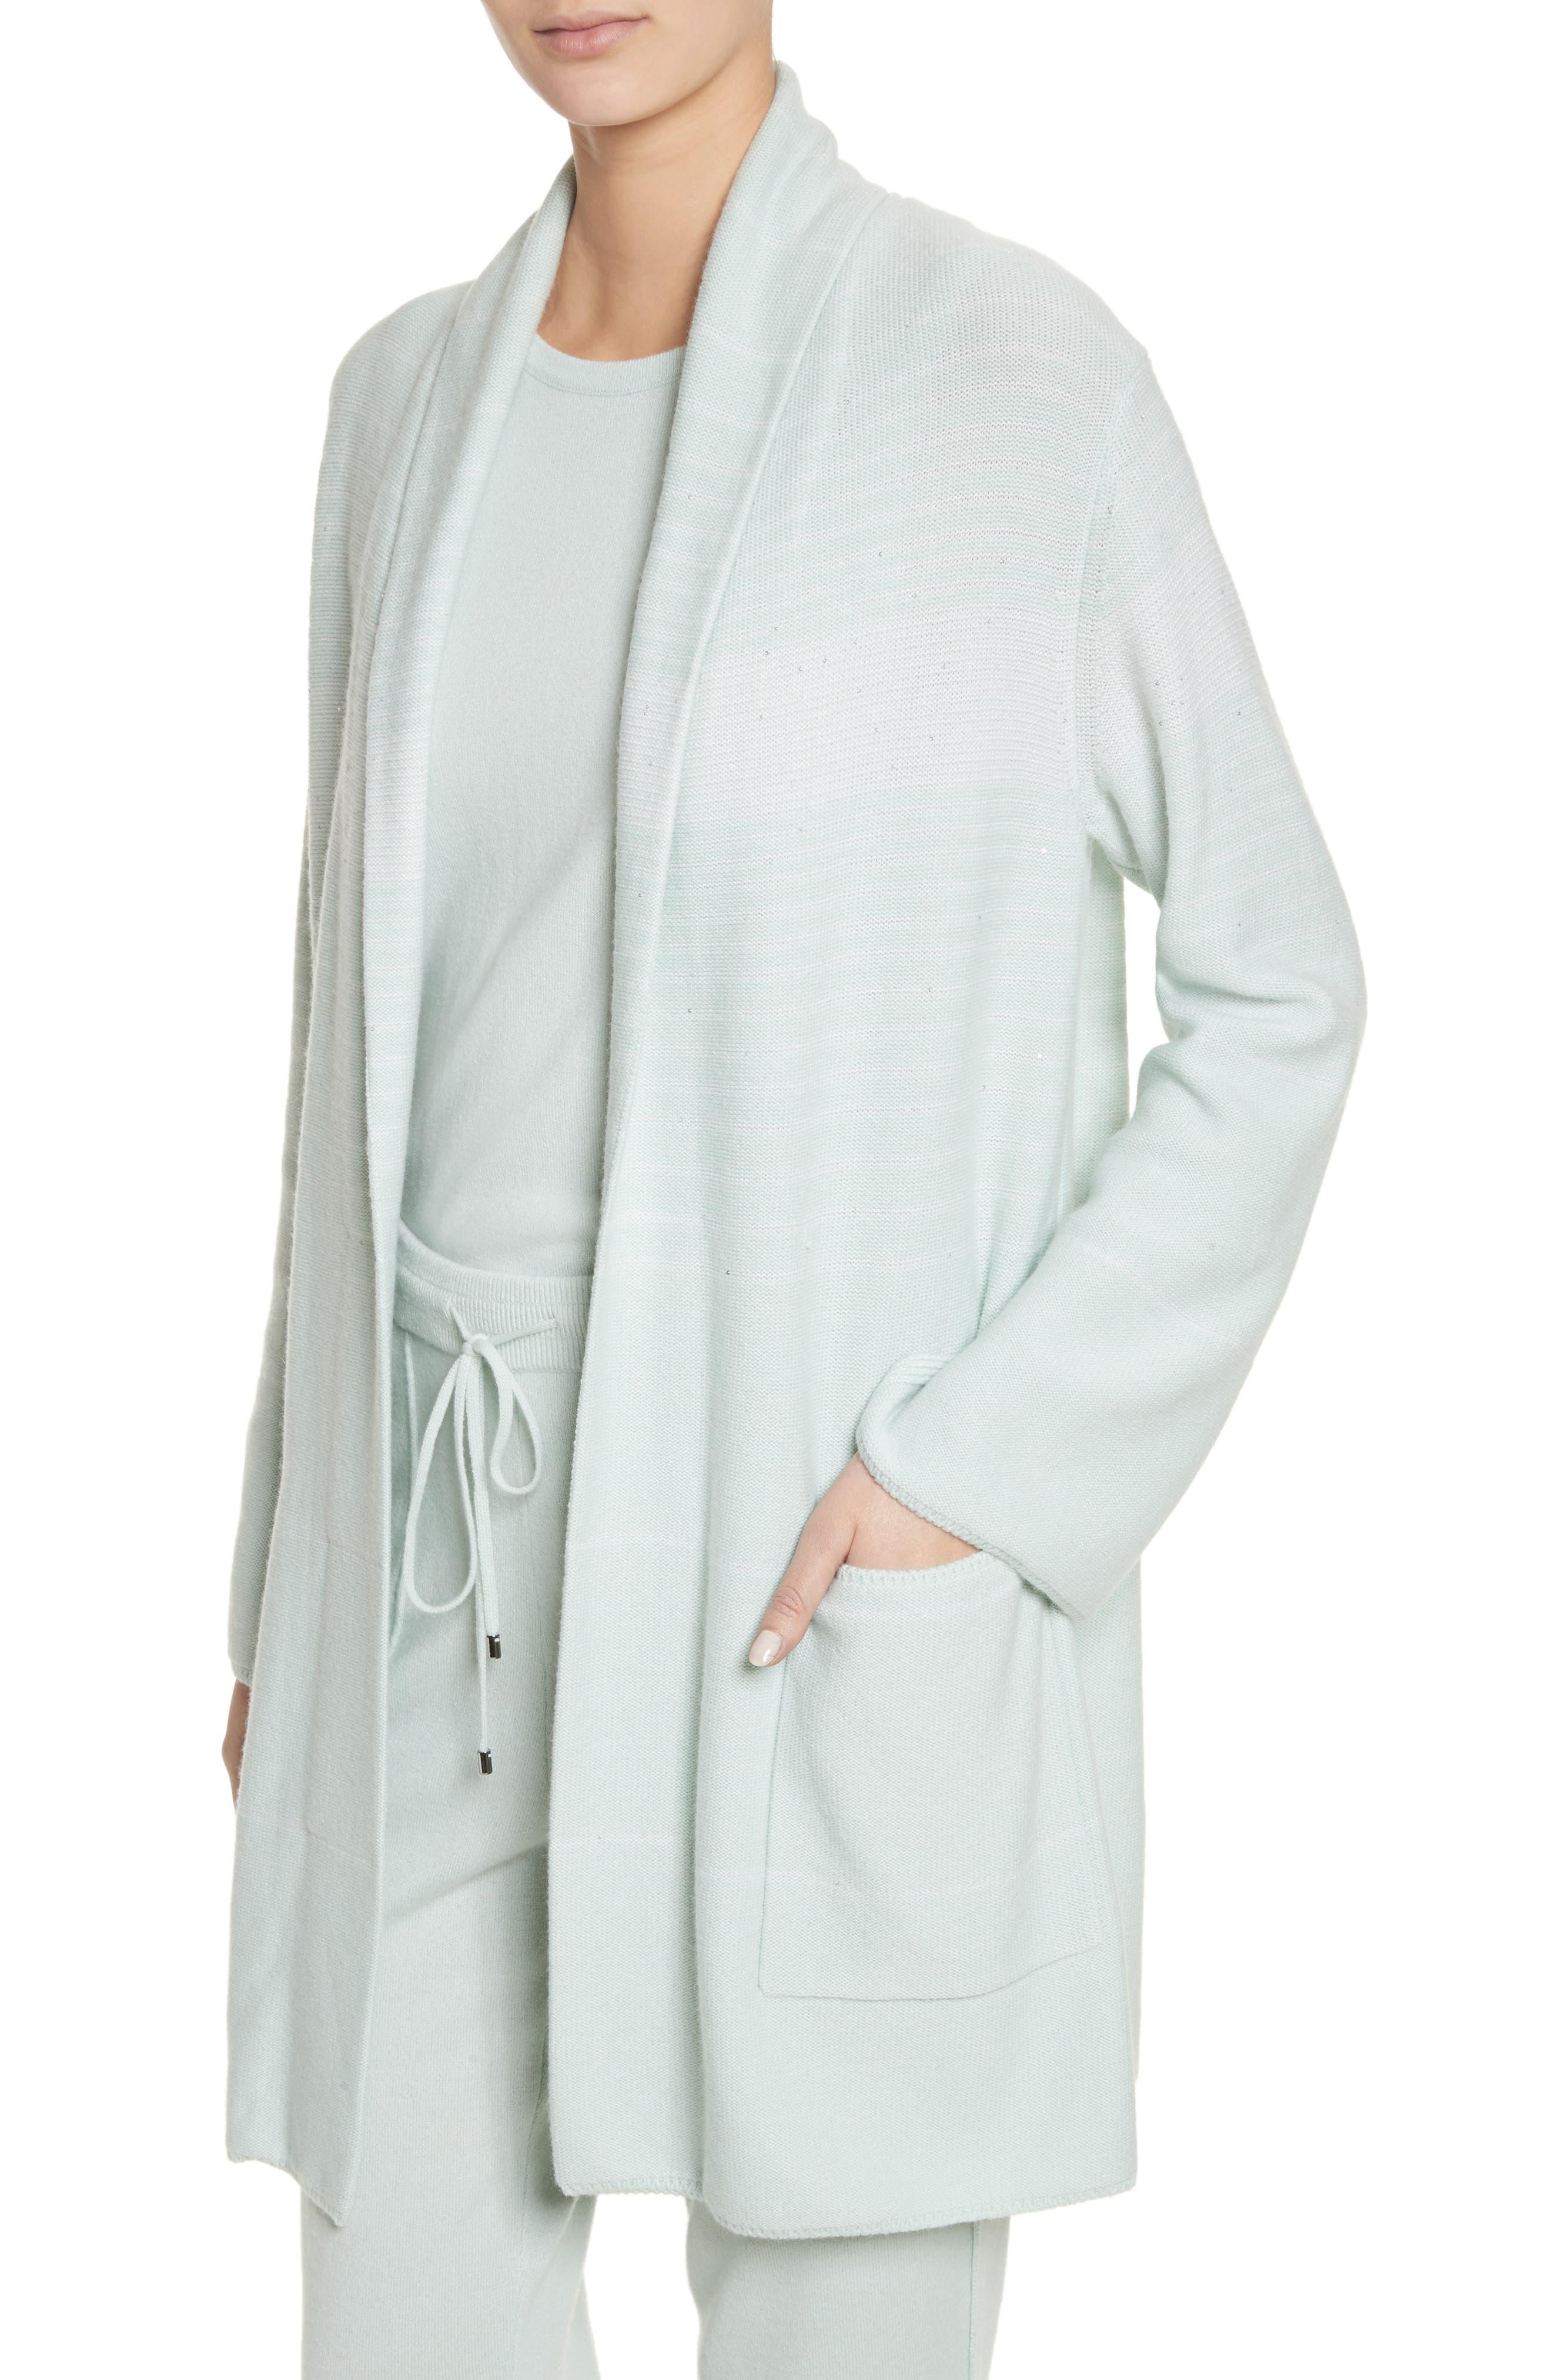 Sequin Cashmere & Silk Cardigan,                             Alternate thumbnail 4, color,                             Mint/ Cream